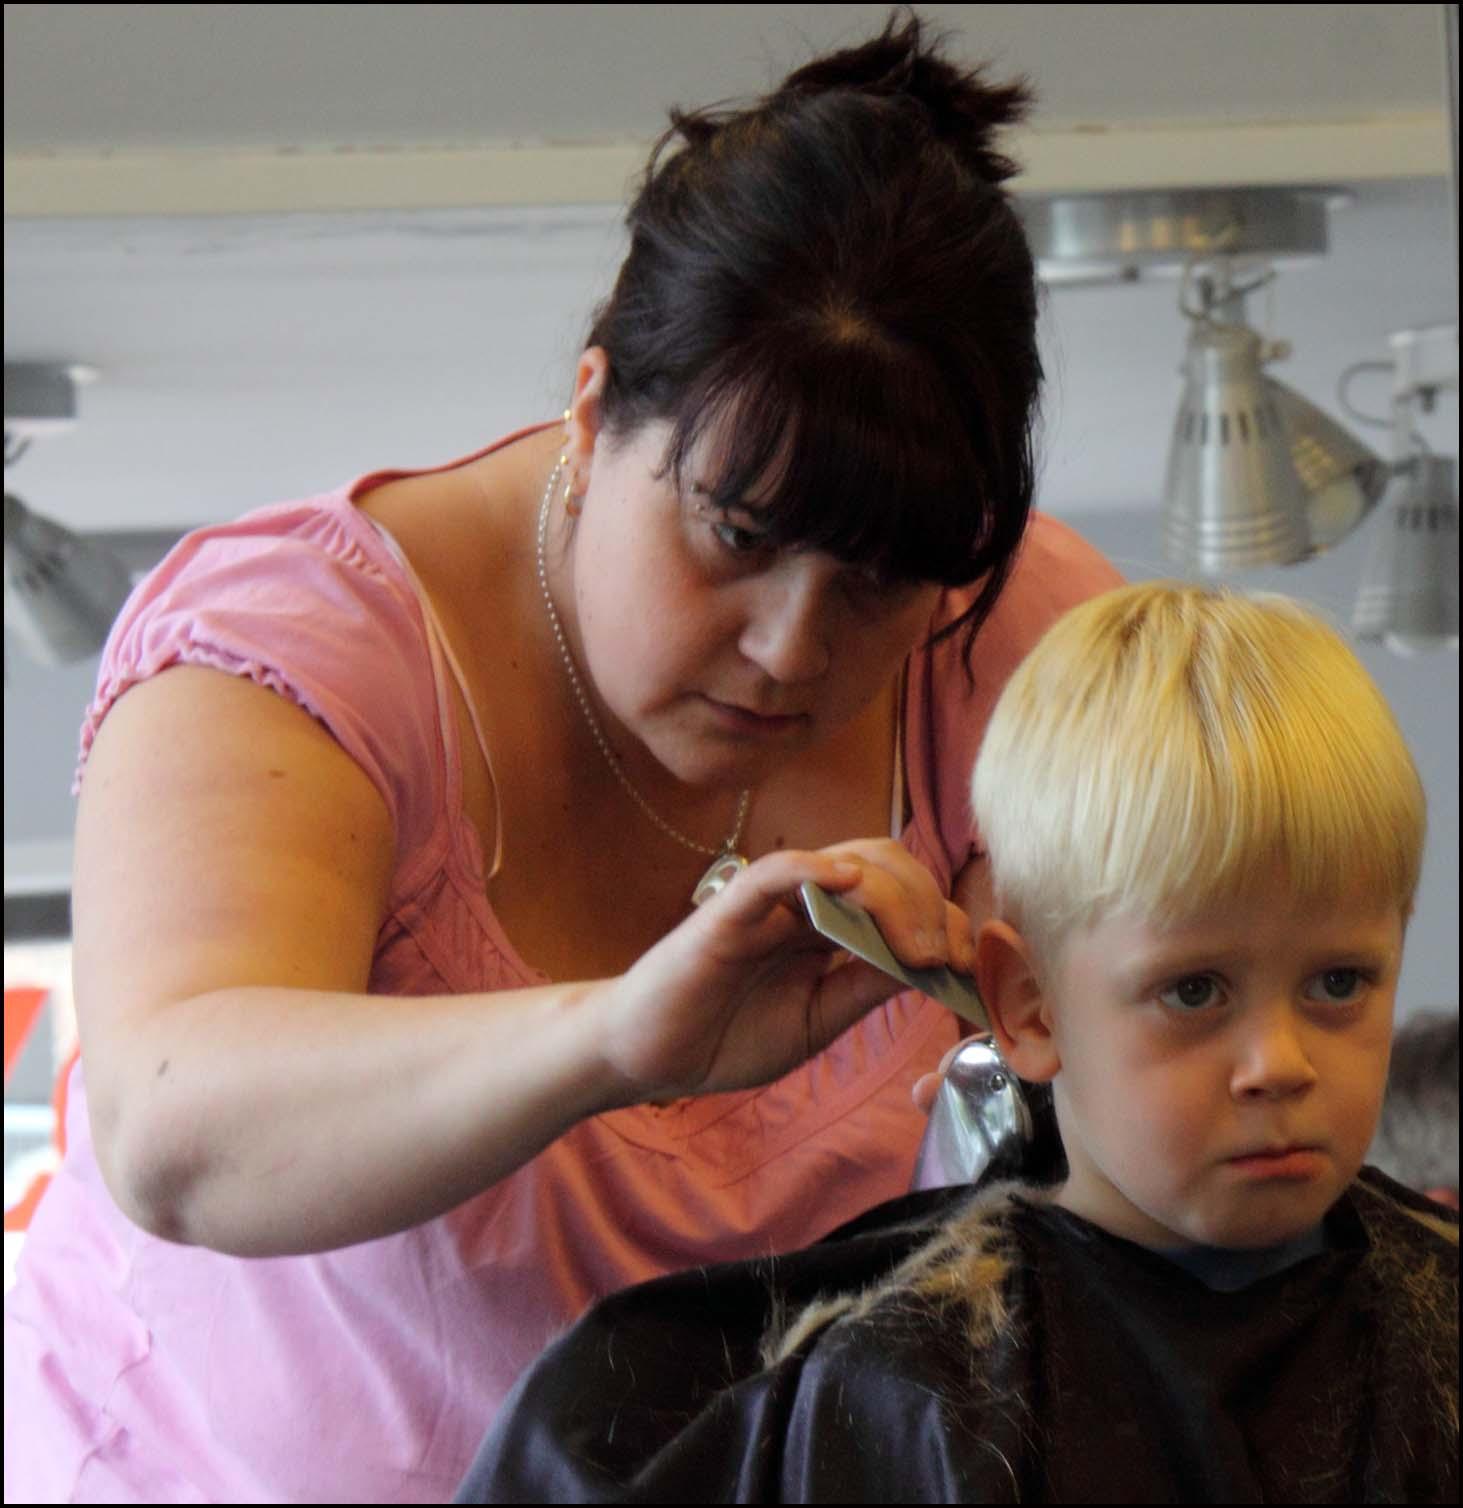 boy,child,barbers,first,visit,trip,cut,trim,barber,hair,haircut,face,head,faces,365days,tonysmith,tony,smith,hotpics,hotpic,hotpick,hotpicks,HOT PIX,tony smith photography,tdktony,tdk,tdktonysmith